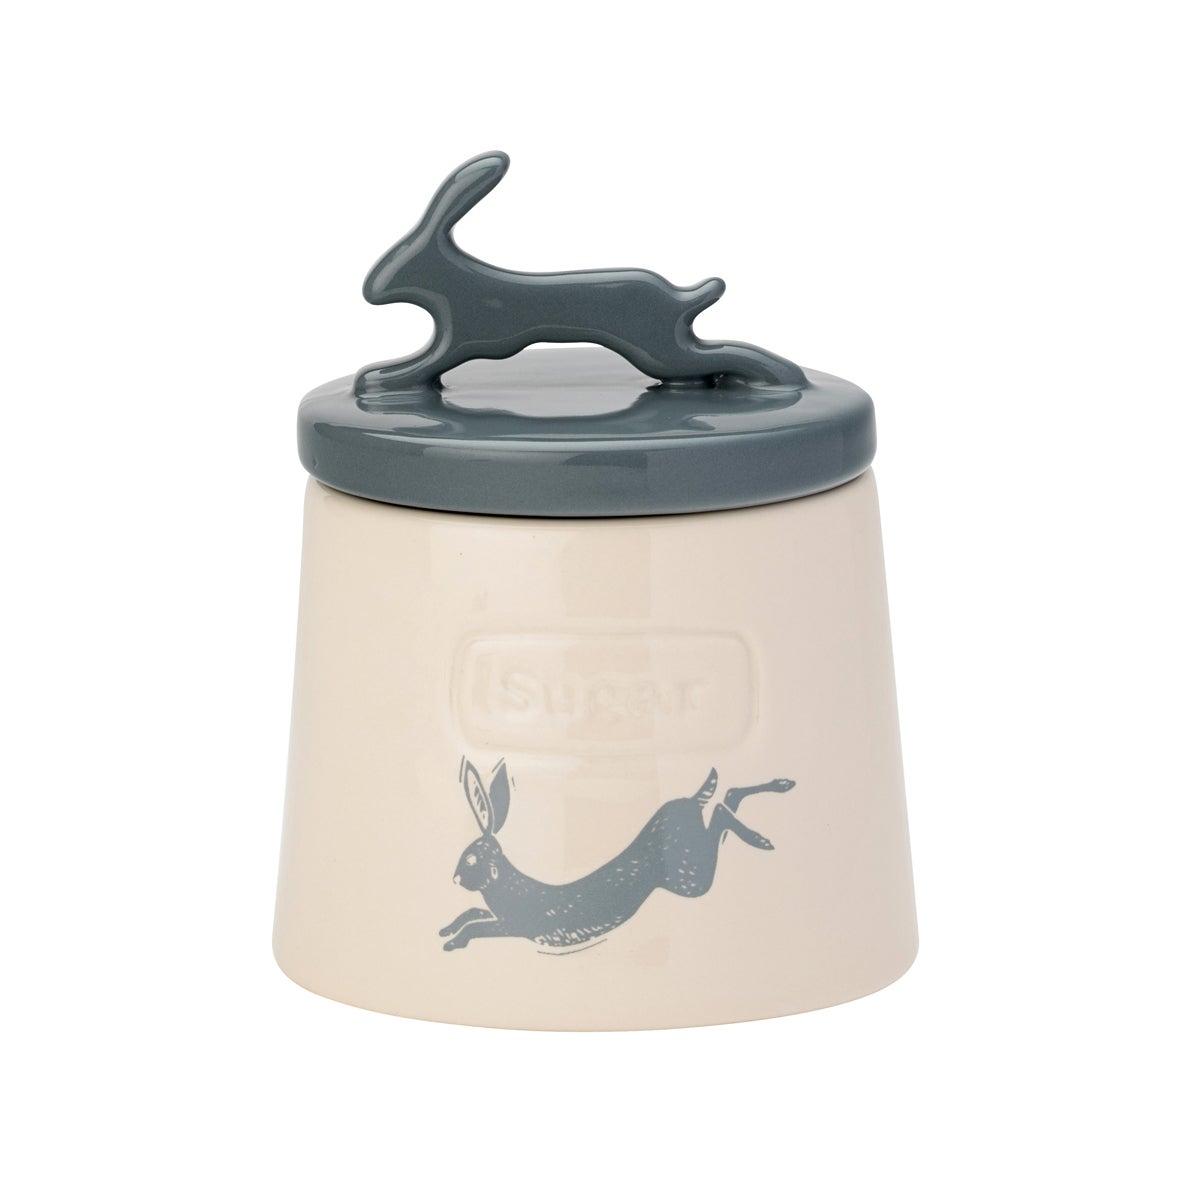 English Tableware Co. Artisan Hare Sugar Pot